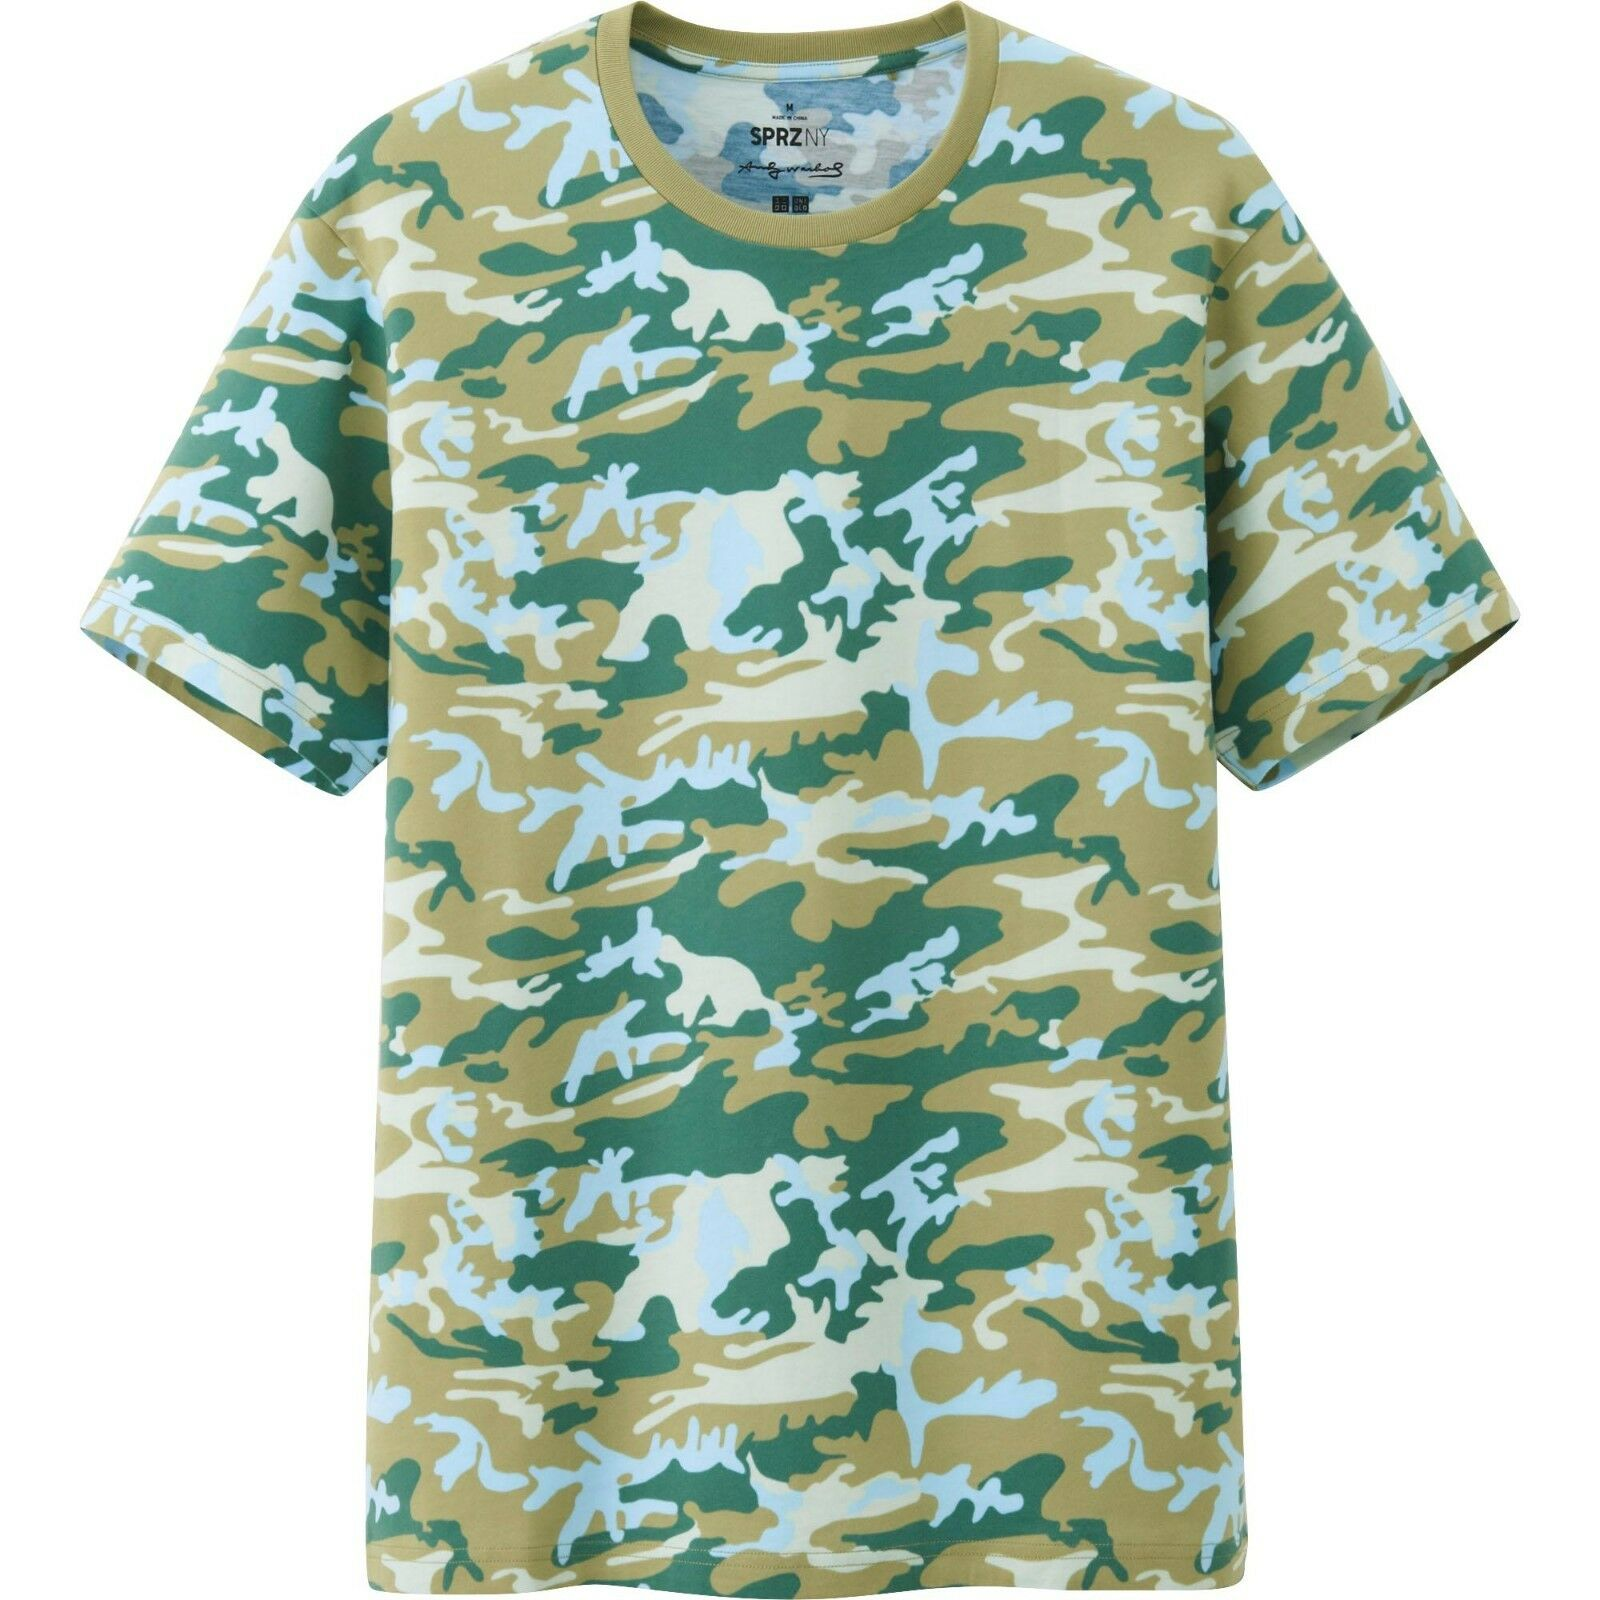 ANDY WARHOL x UNIQLO 'Camouflage' SPRZ NY Art T-Shirt Men's S Beige Camo NWT